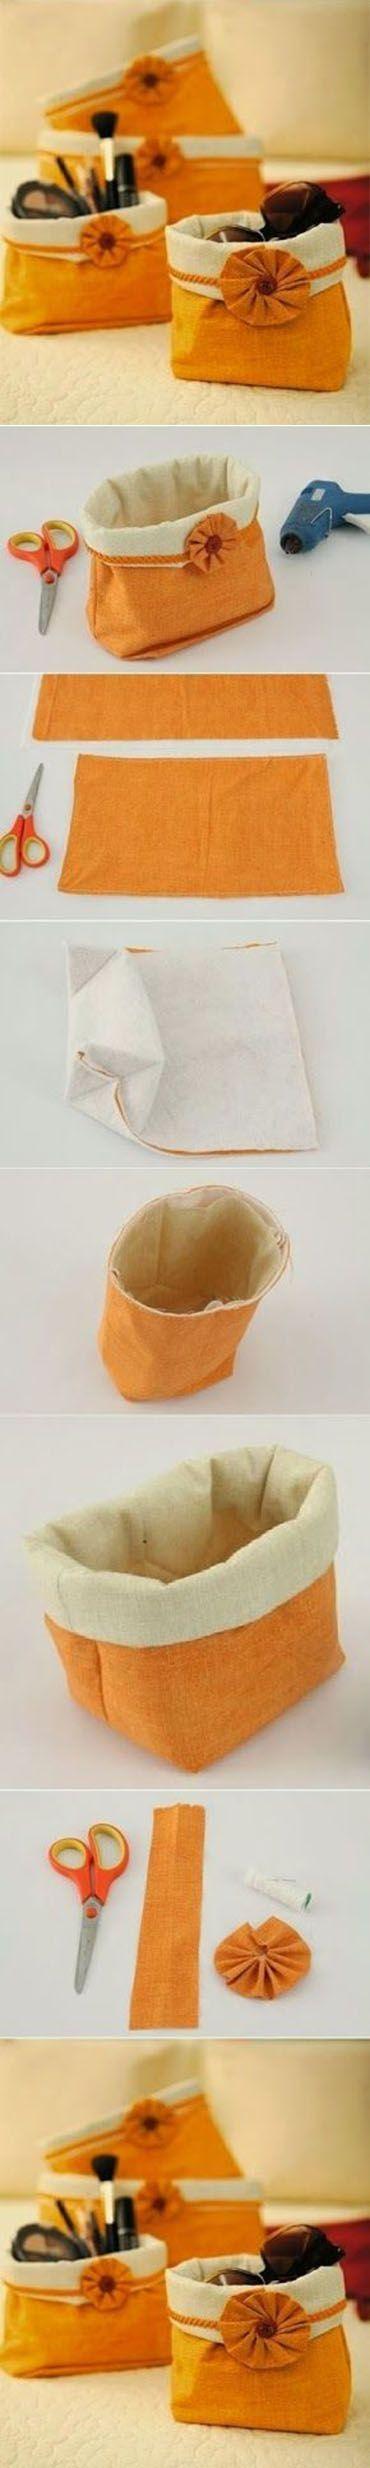 Cool Container | DIY & Crafts Tutorials by olga